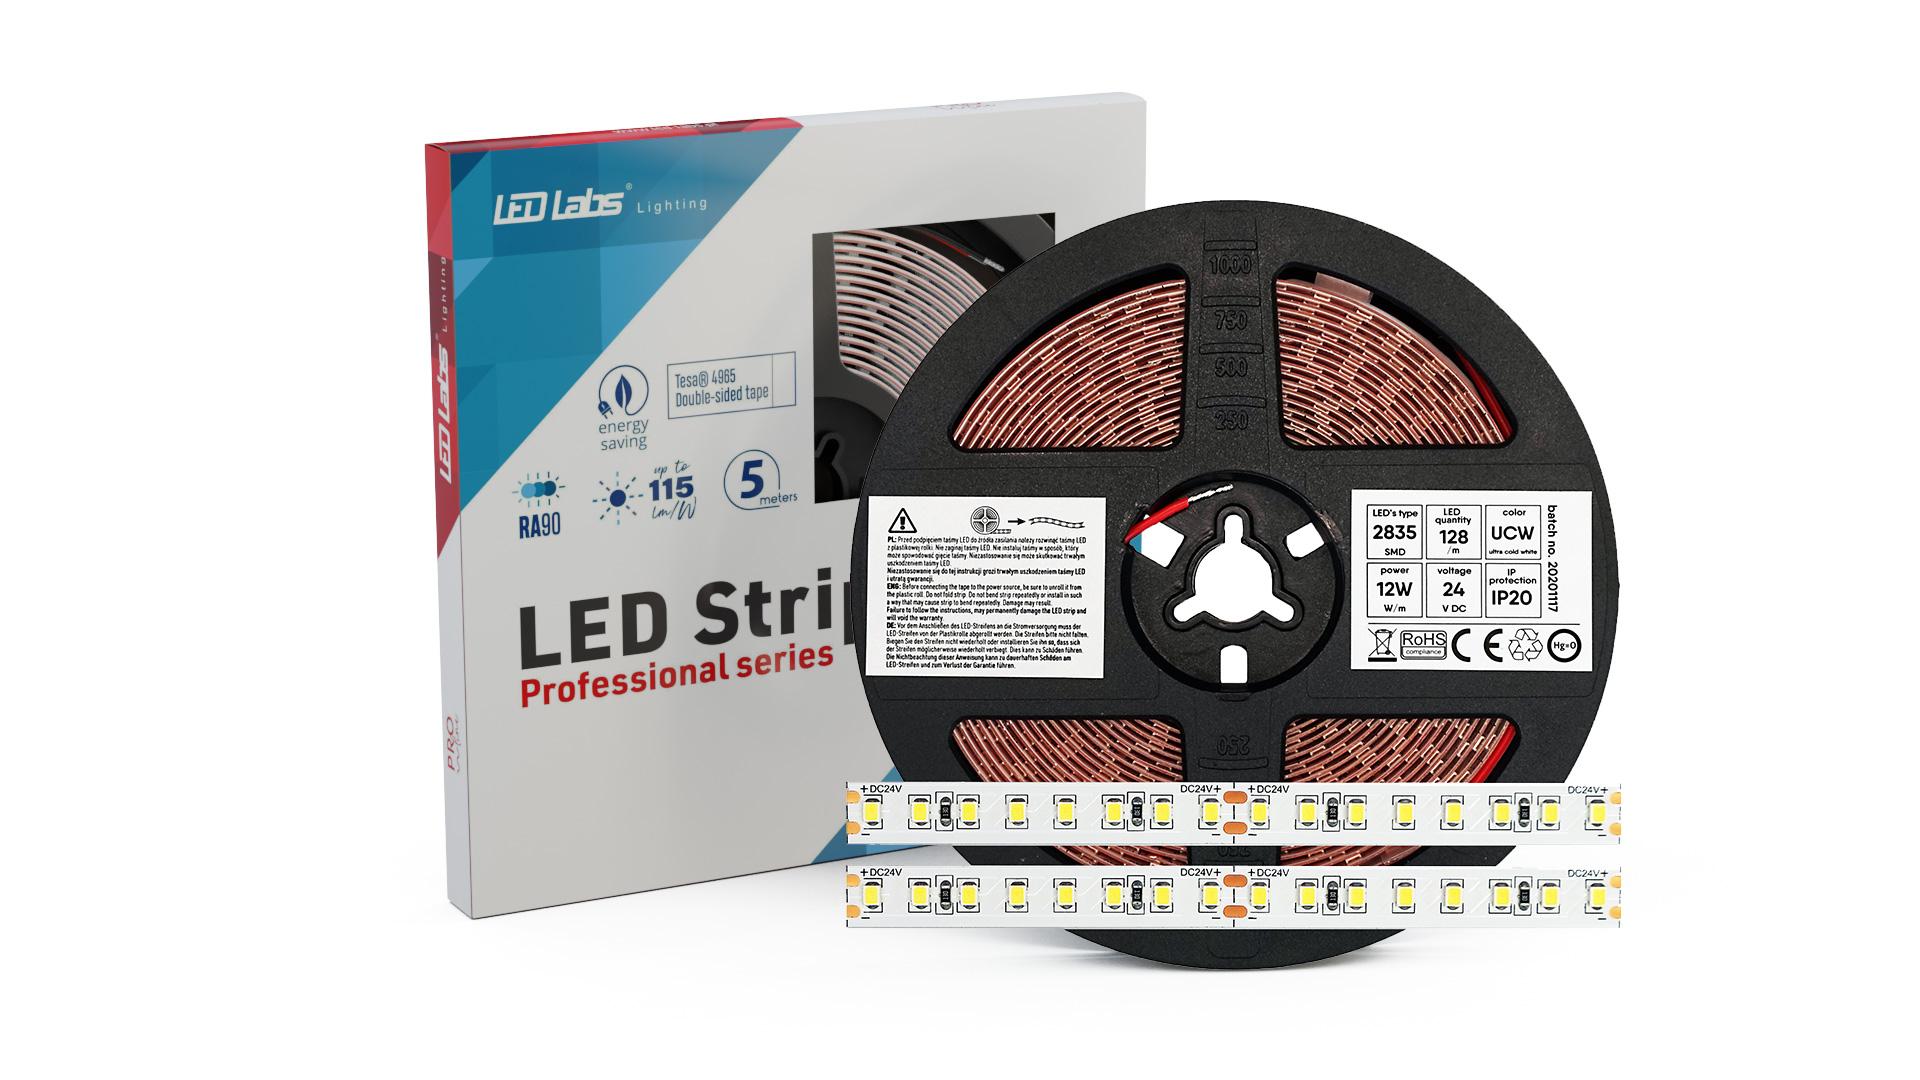 LED Strip PRO 5Y 24V 640 LED 2835 SMD 12W 4000K RA90